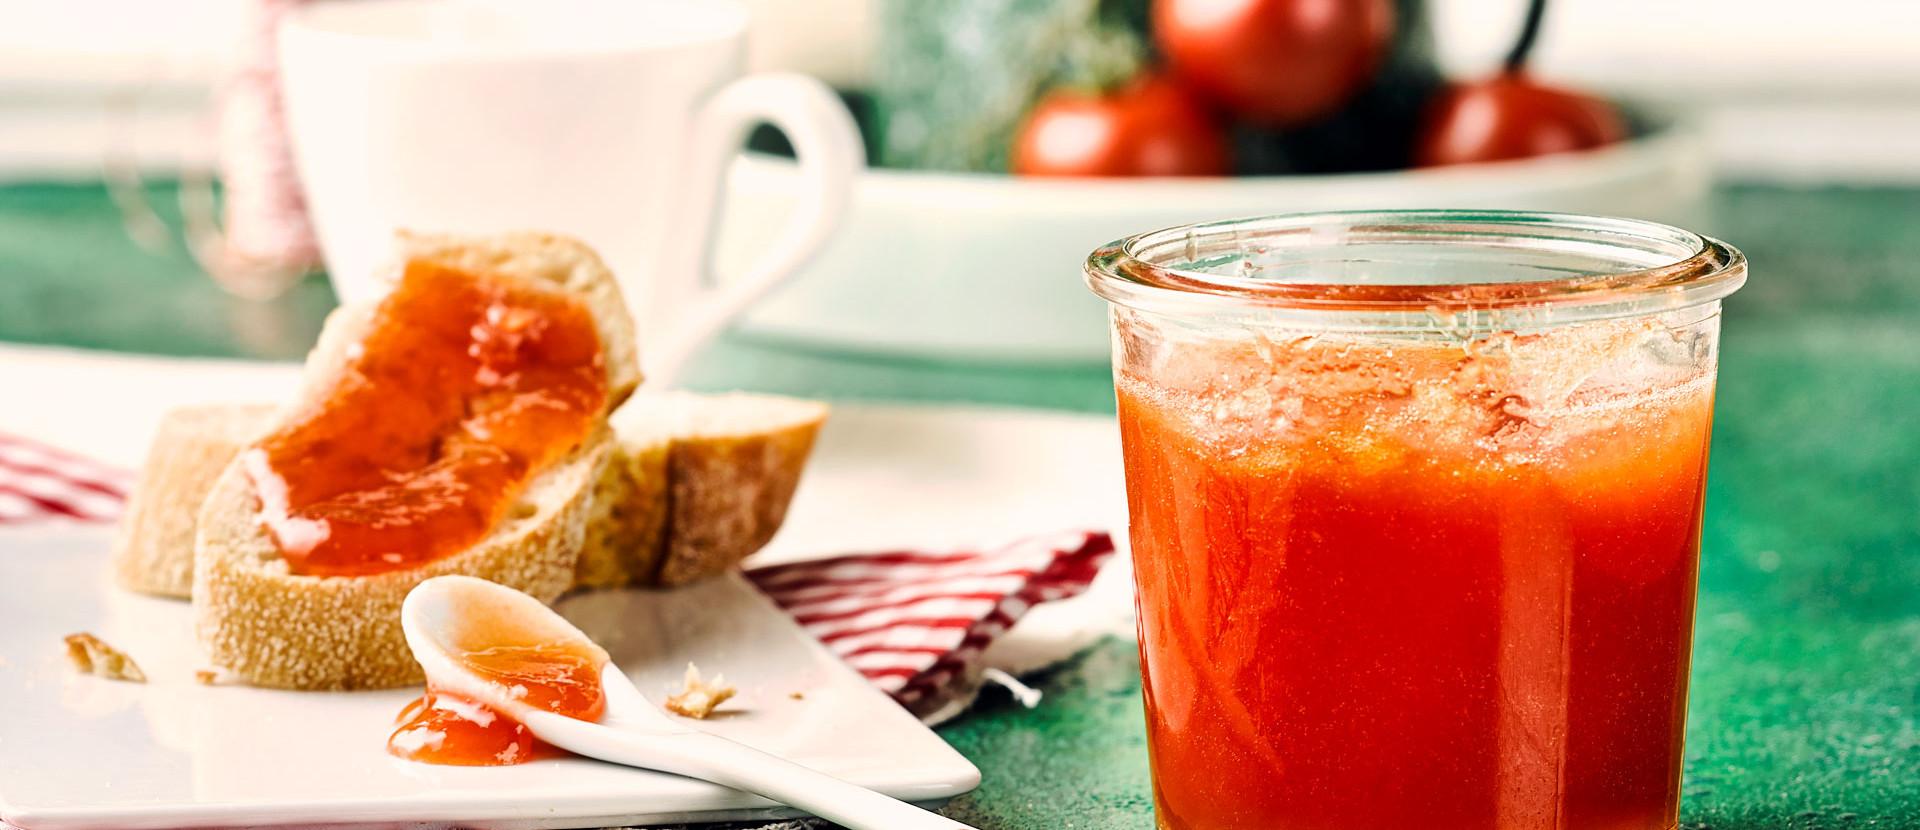 Tomaten Konfituere Baguette